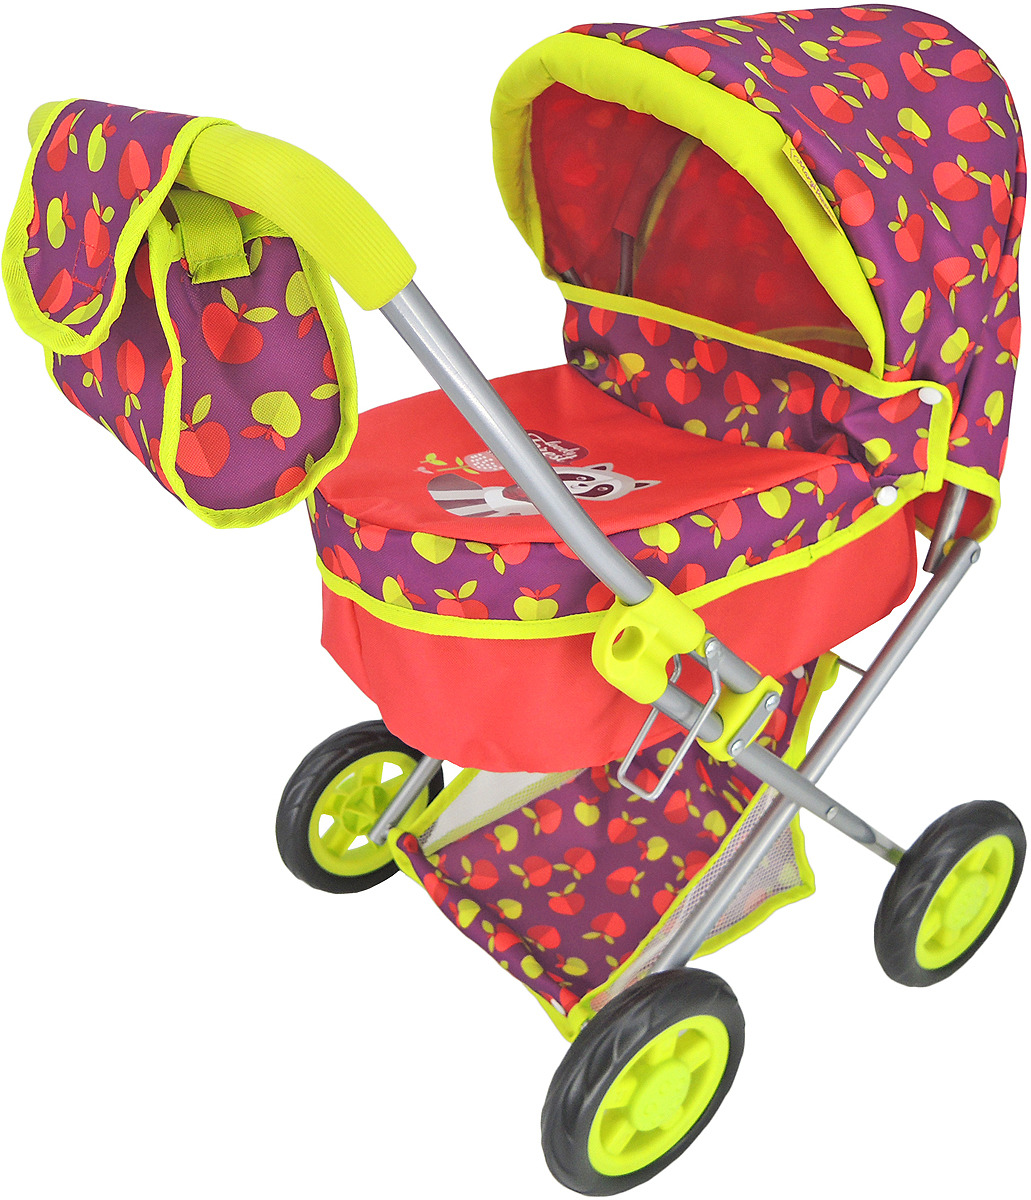 все цены на Коляска для куклы Mary Poppins Cherry, 67337 онлайн